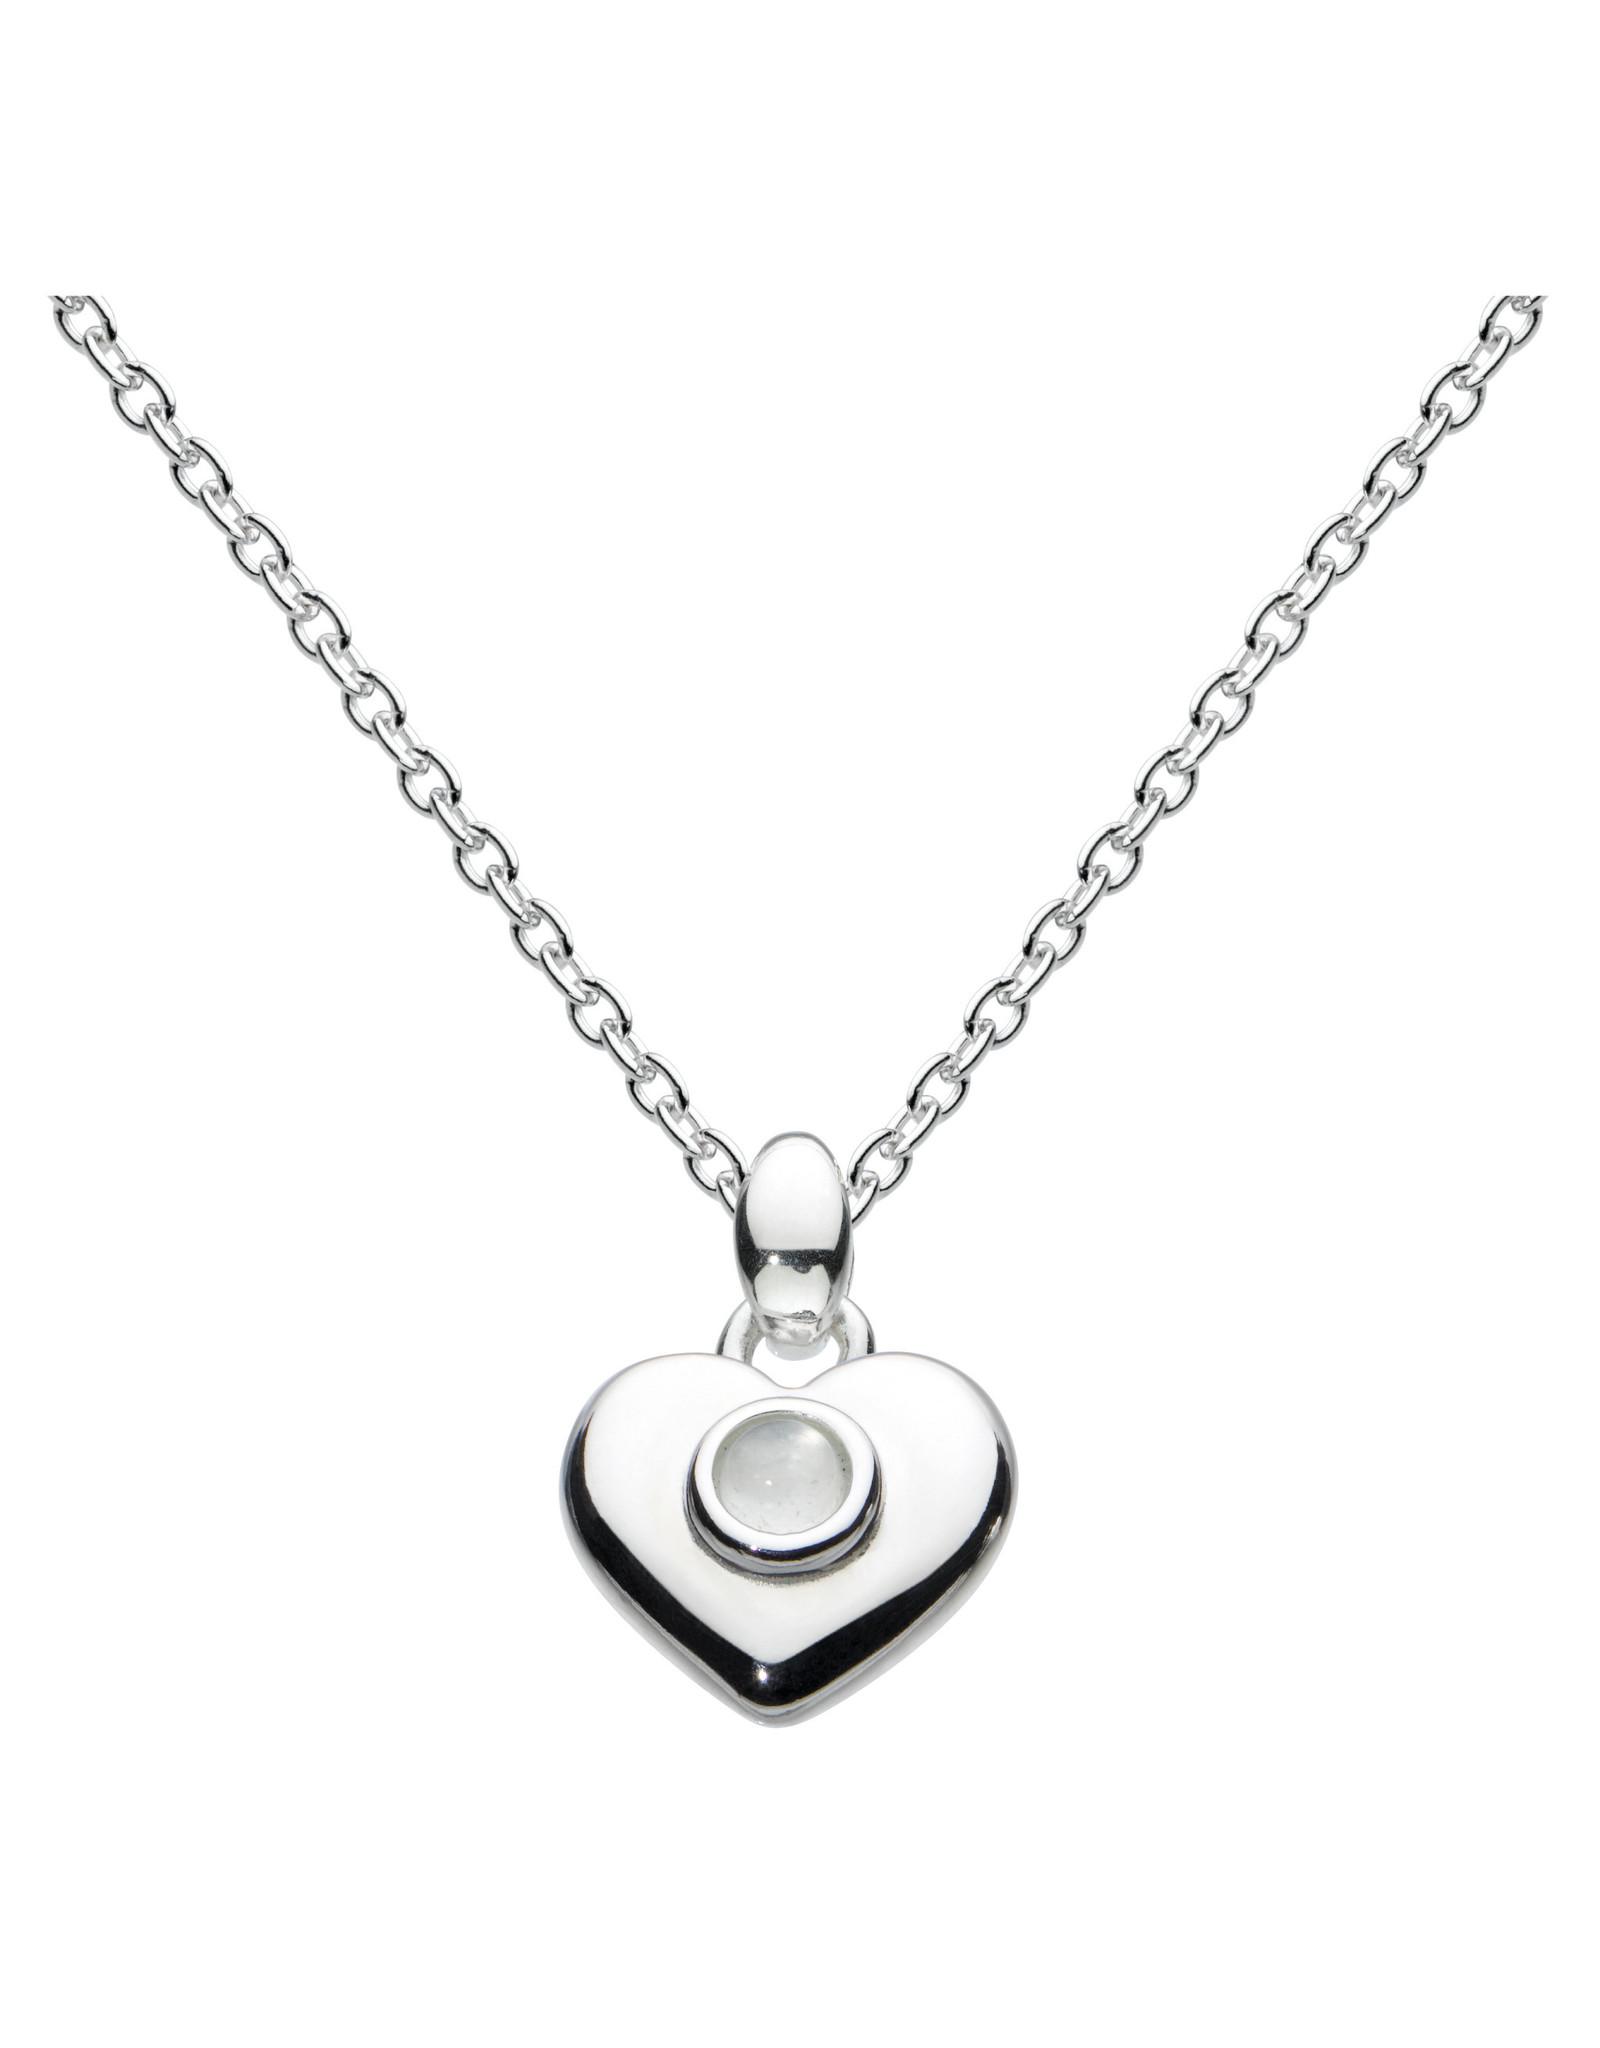 "Girls Silver October Birthstone Heart Necklace, 14"" -16"""